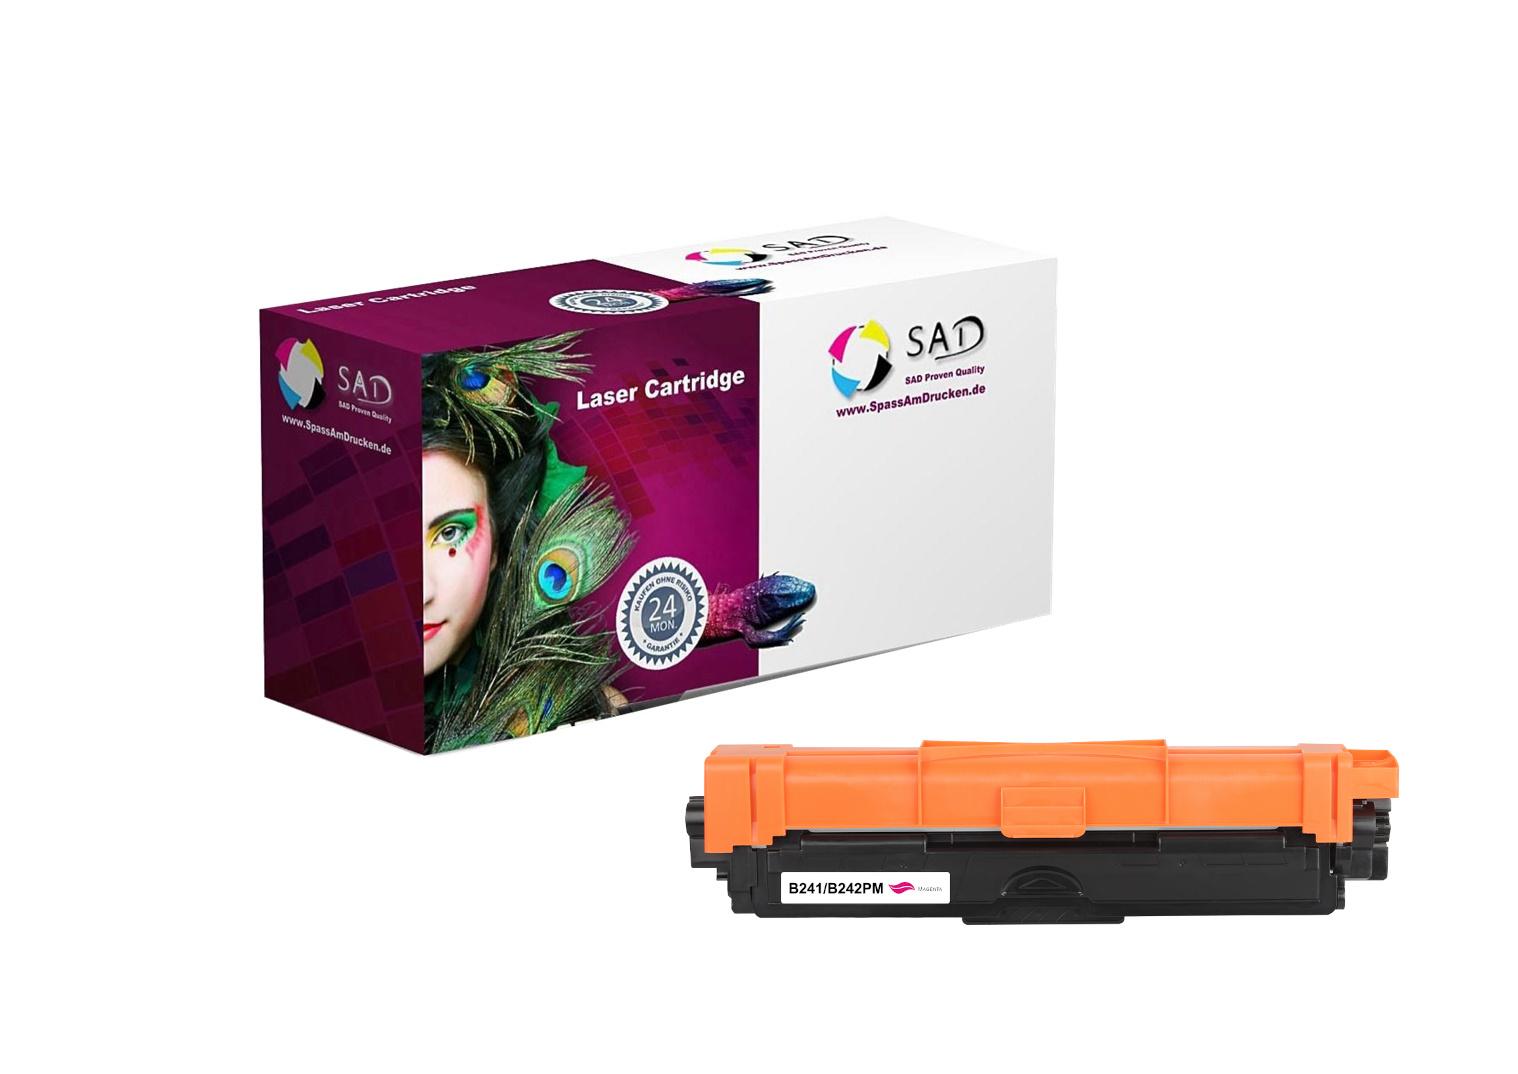 SAD Premium Toner komp. zu Brother TN-241M / TN-242M magenta ca. 1.400 Seiten